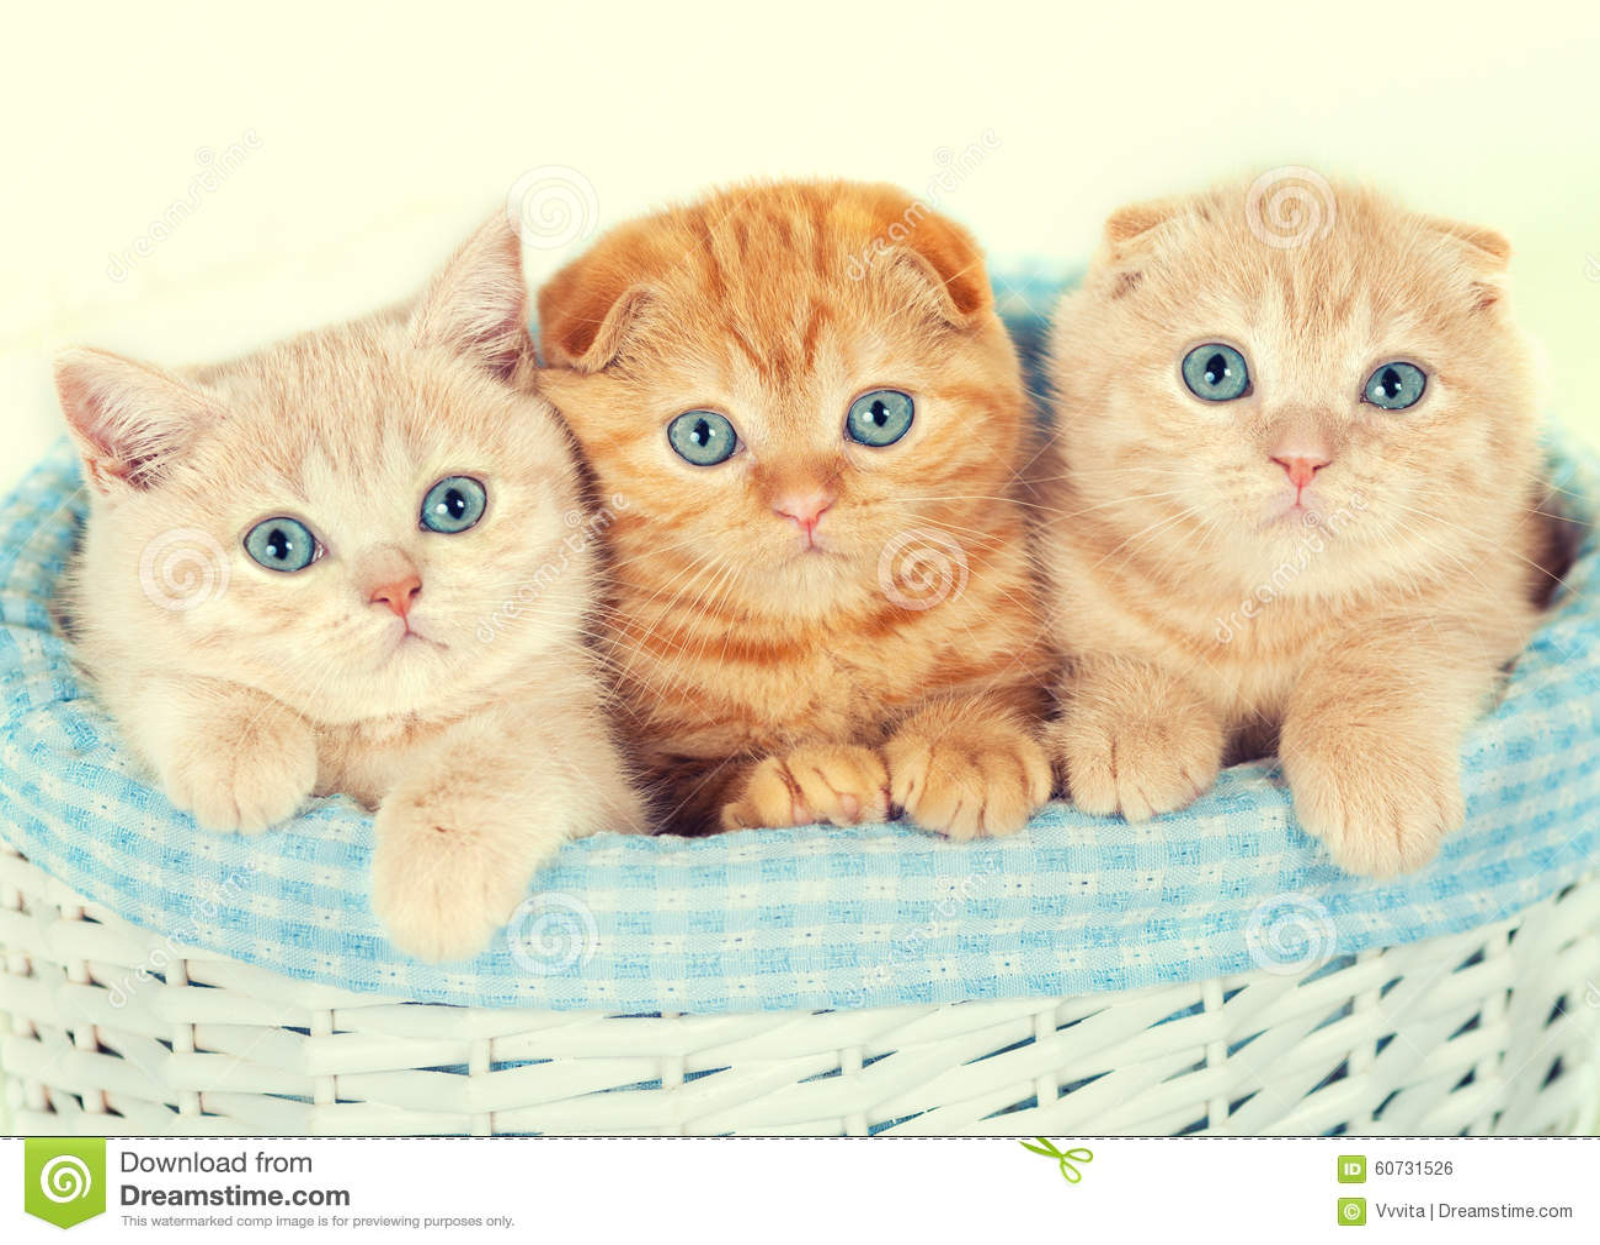 Trois petits chatons